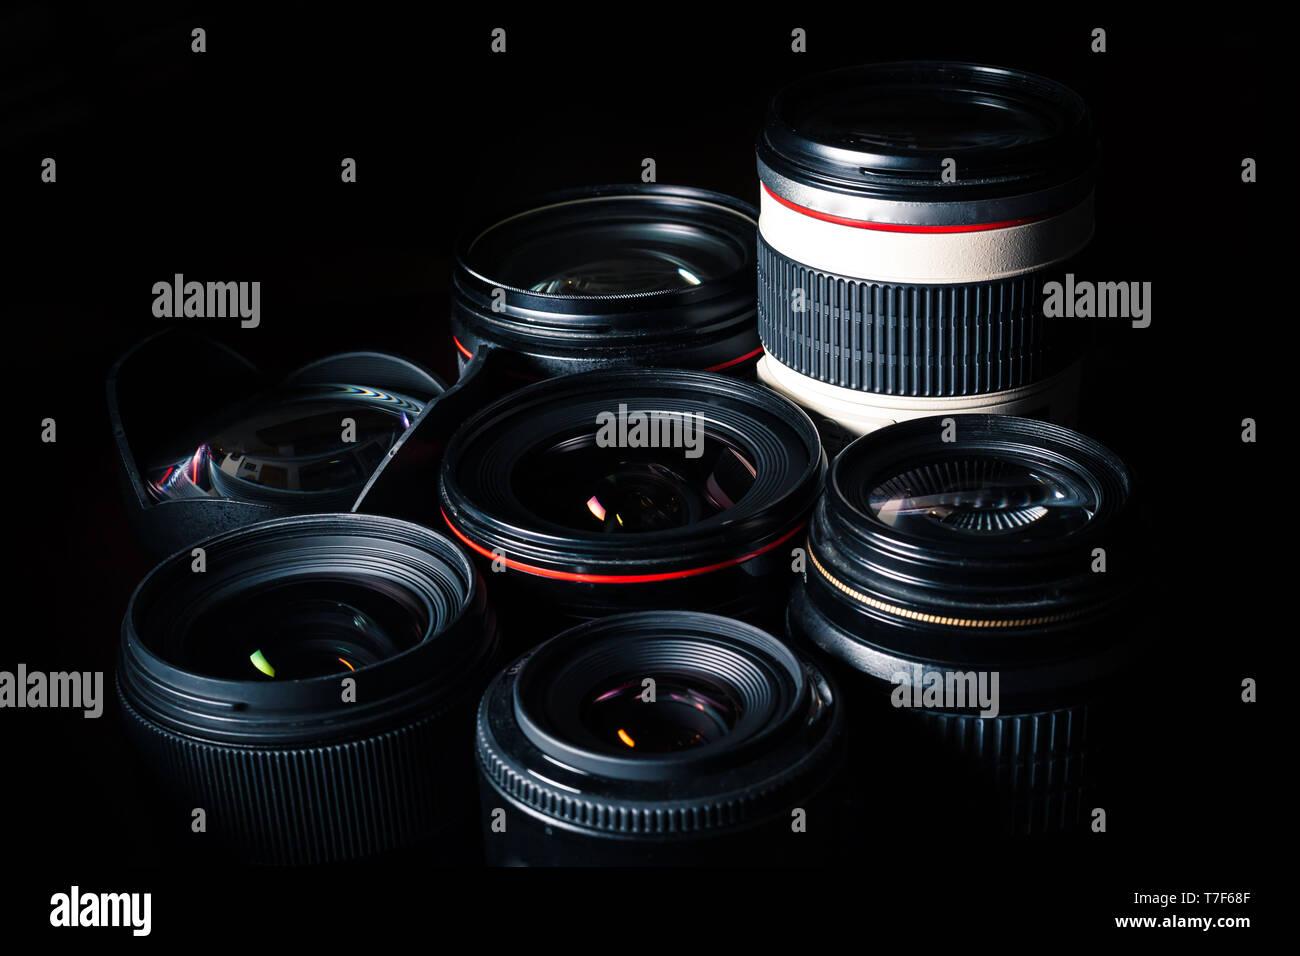 Set of different DSLR lenses on a dark background - Stock Image